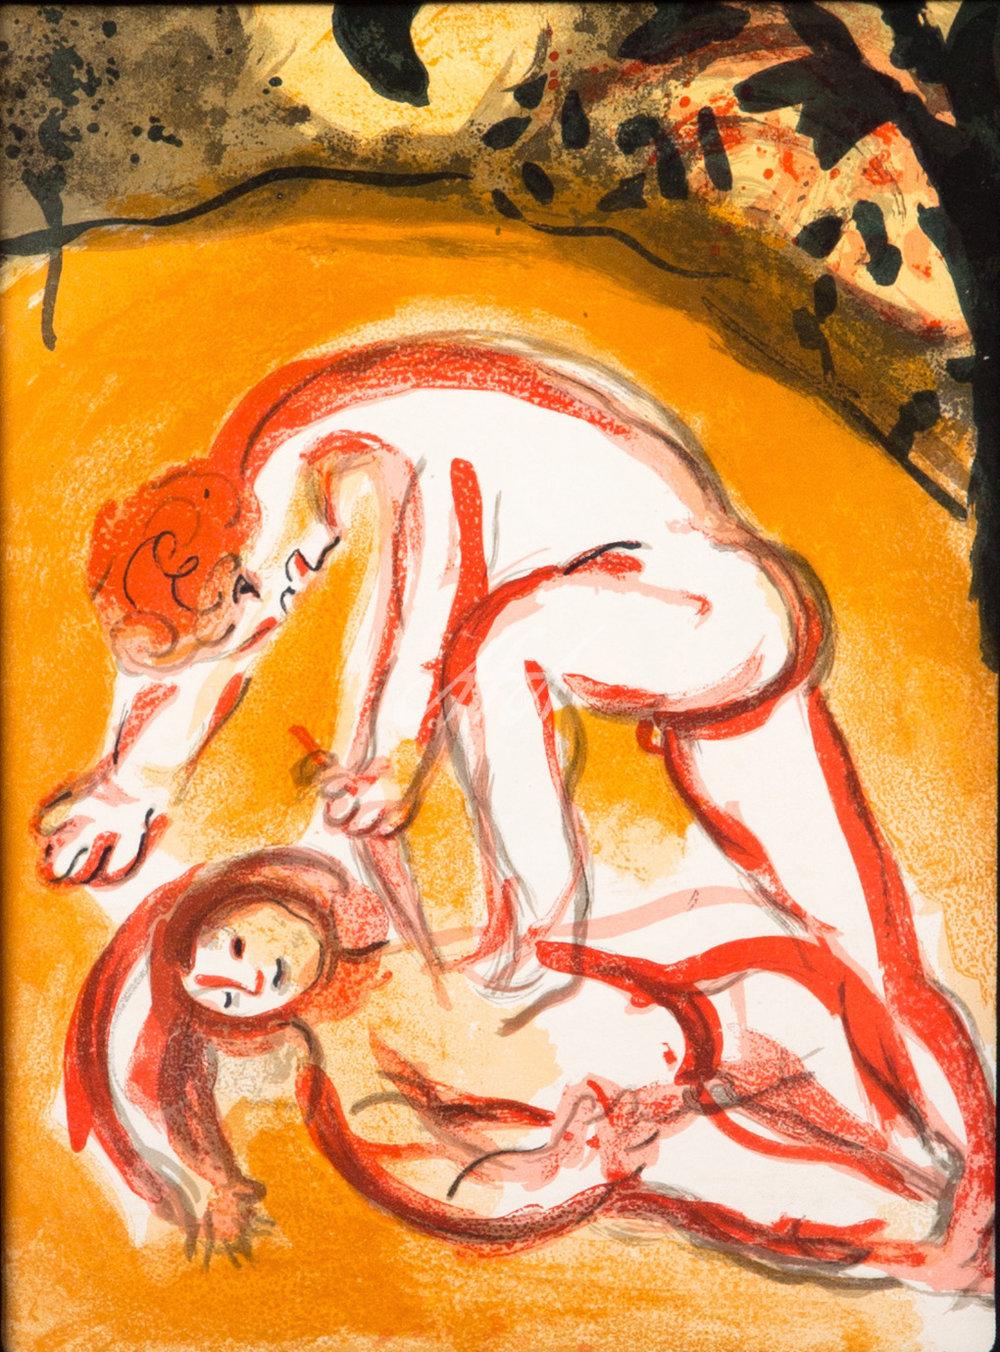 Marc_Chagall_knife1 LoRes watermark.jpg